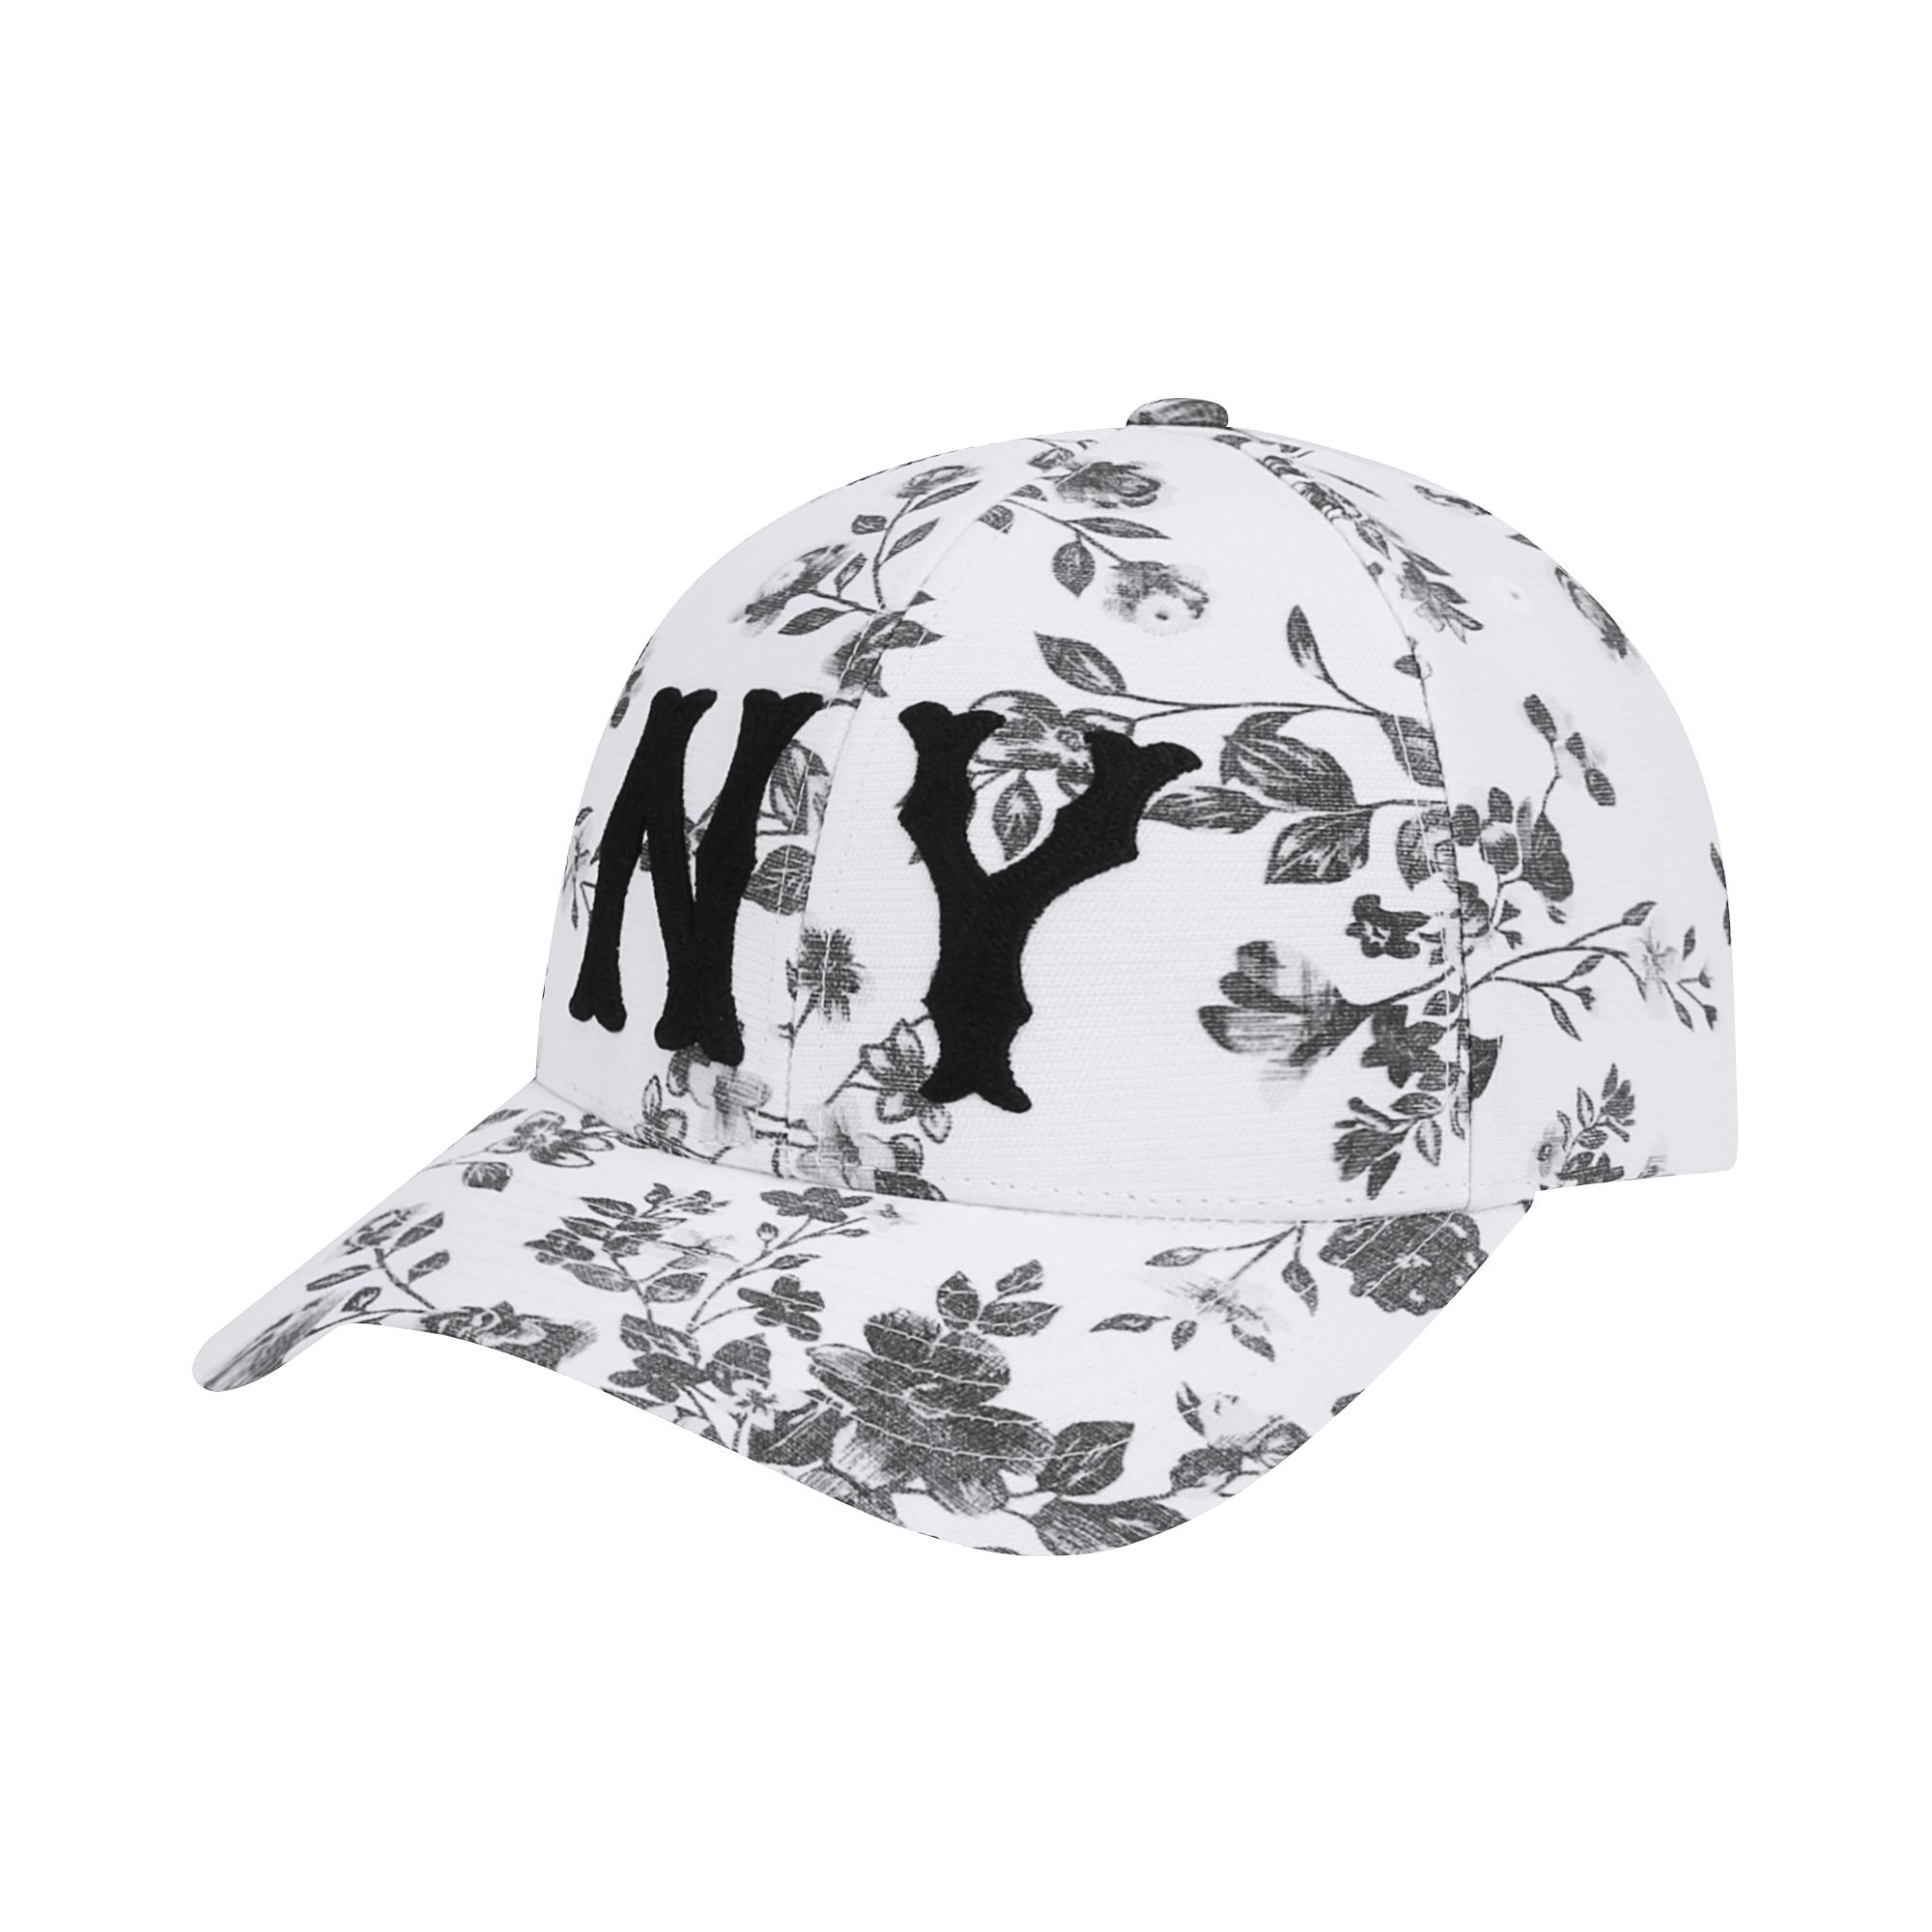 NEW YORK YANKEES JOUY NY ADJUSTABLE CAP